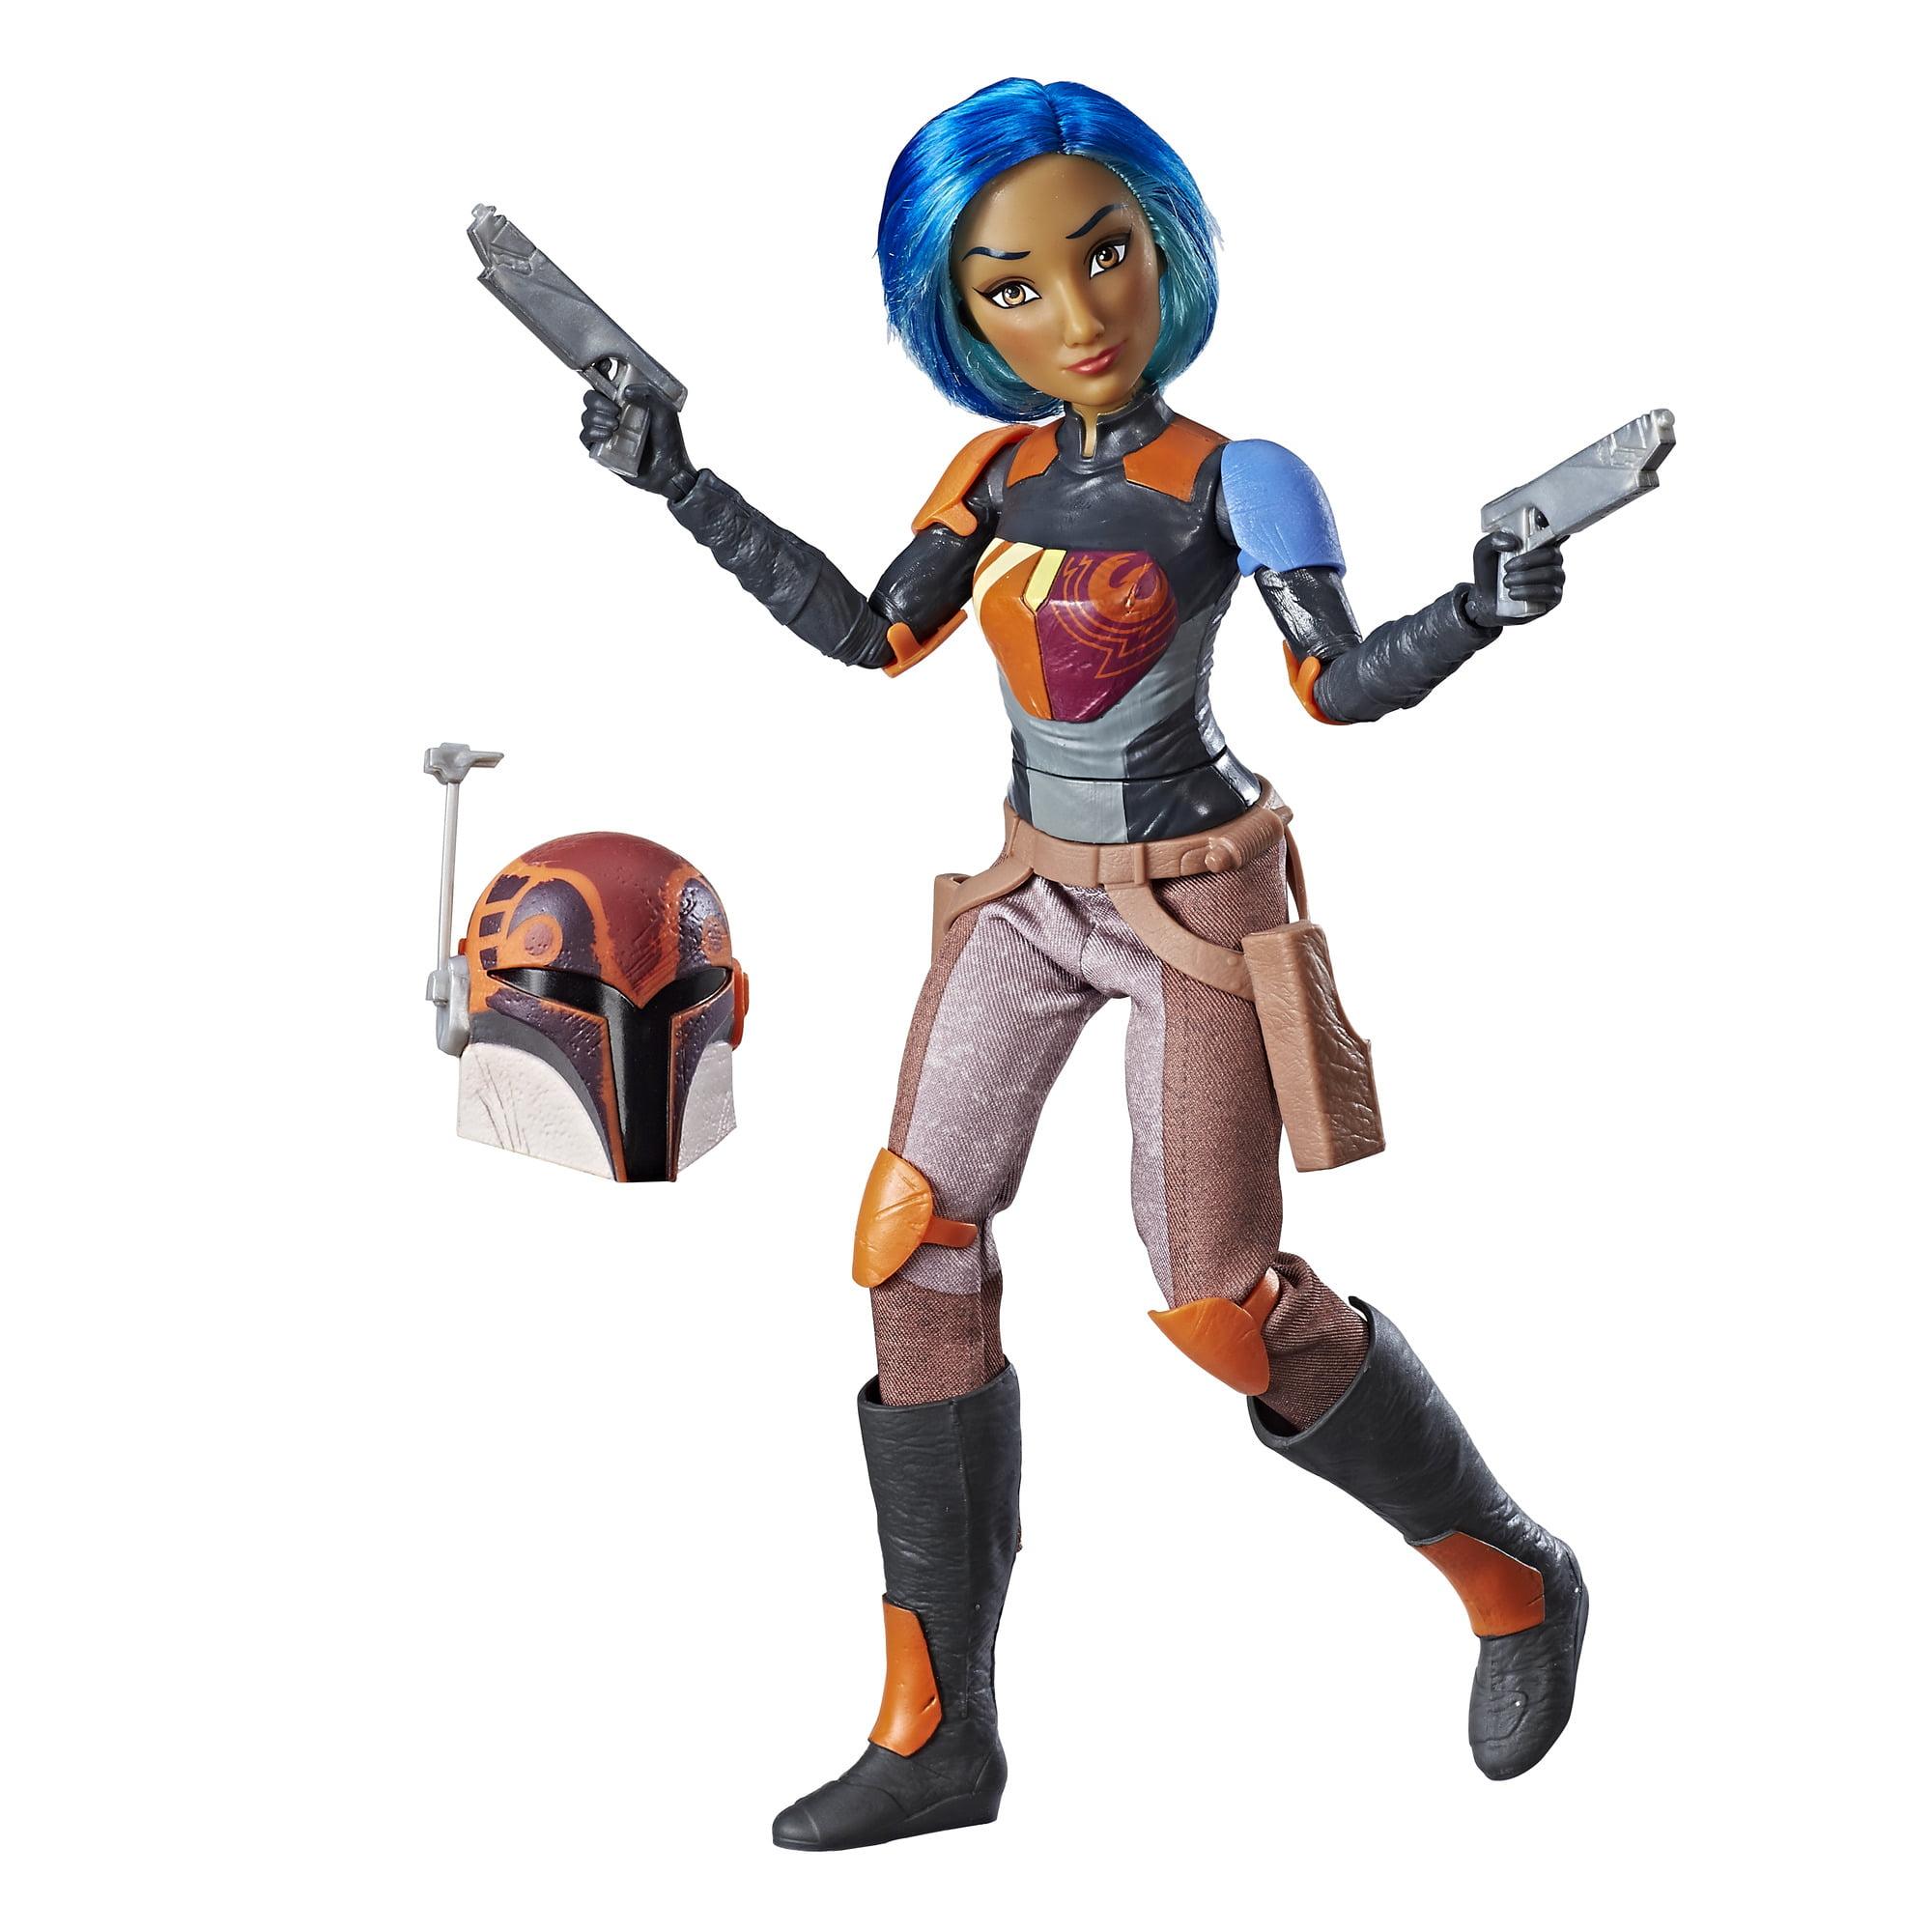 Star Wars Forces of Destiny Sabine Wren Adventure Figure